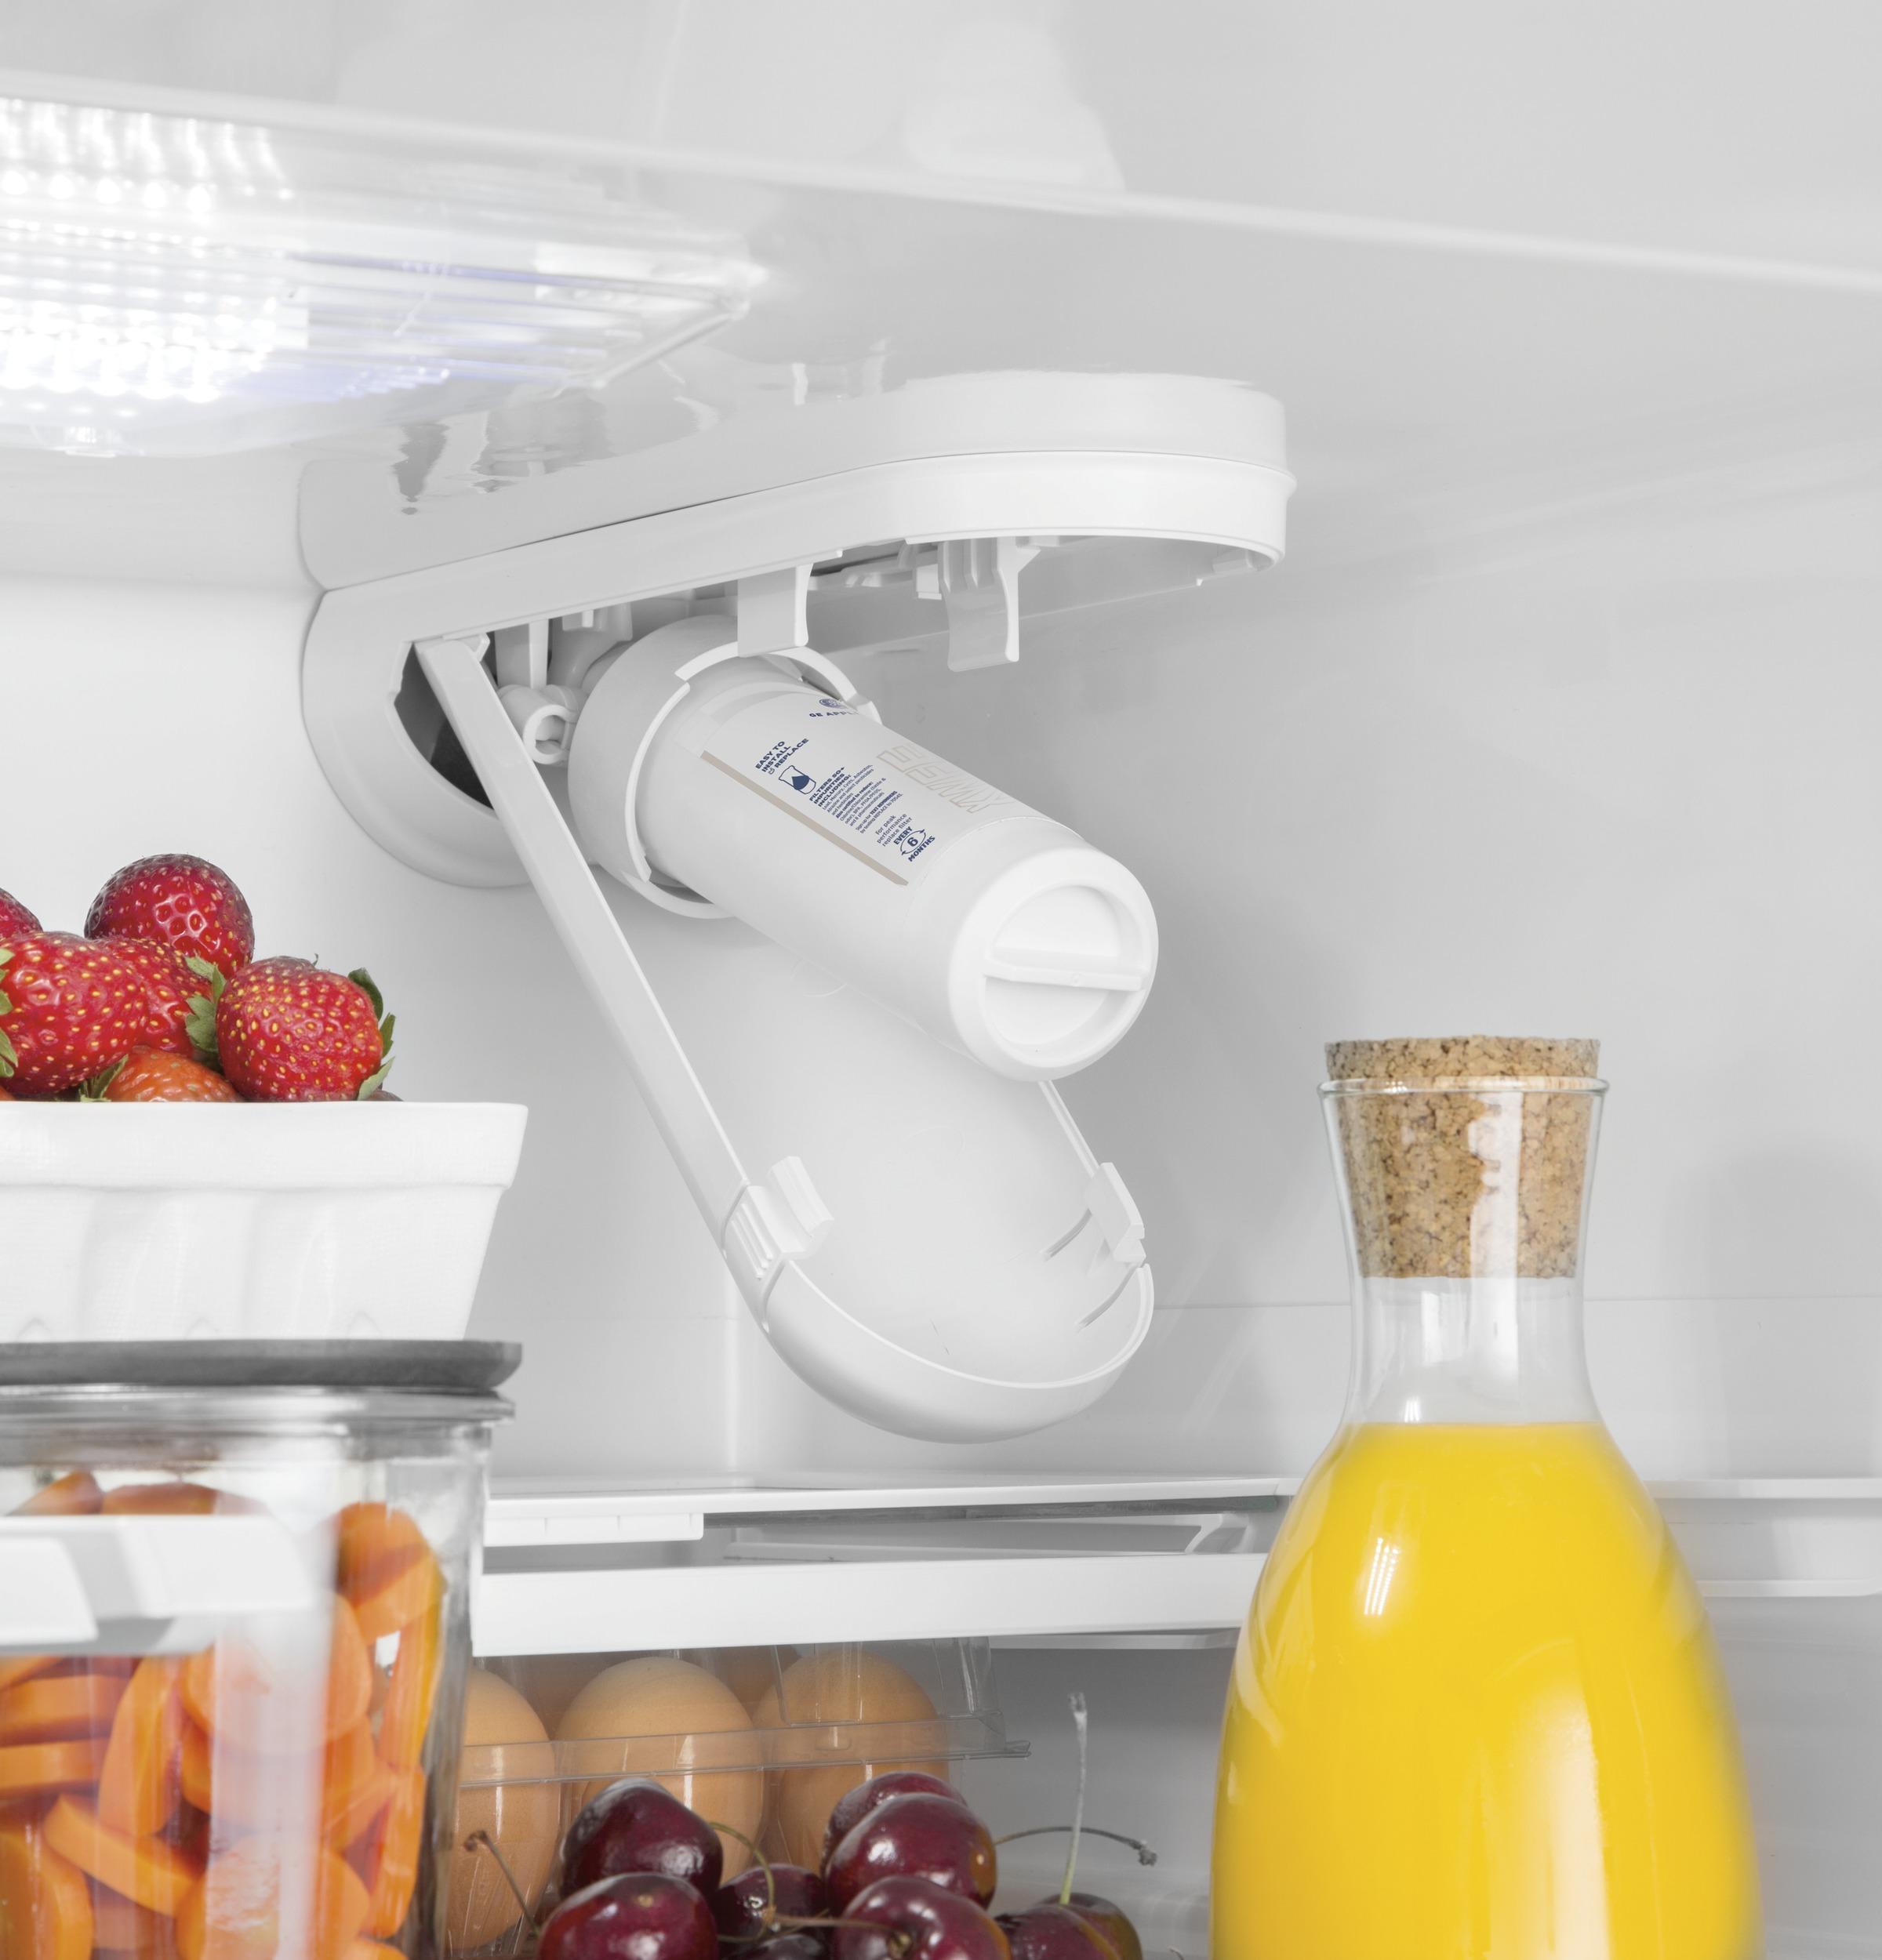 Model: GNE25JGKWW | GE GE® ENERGY STAR® 24.7 Cu. Ft. French-Door Refrigerator